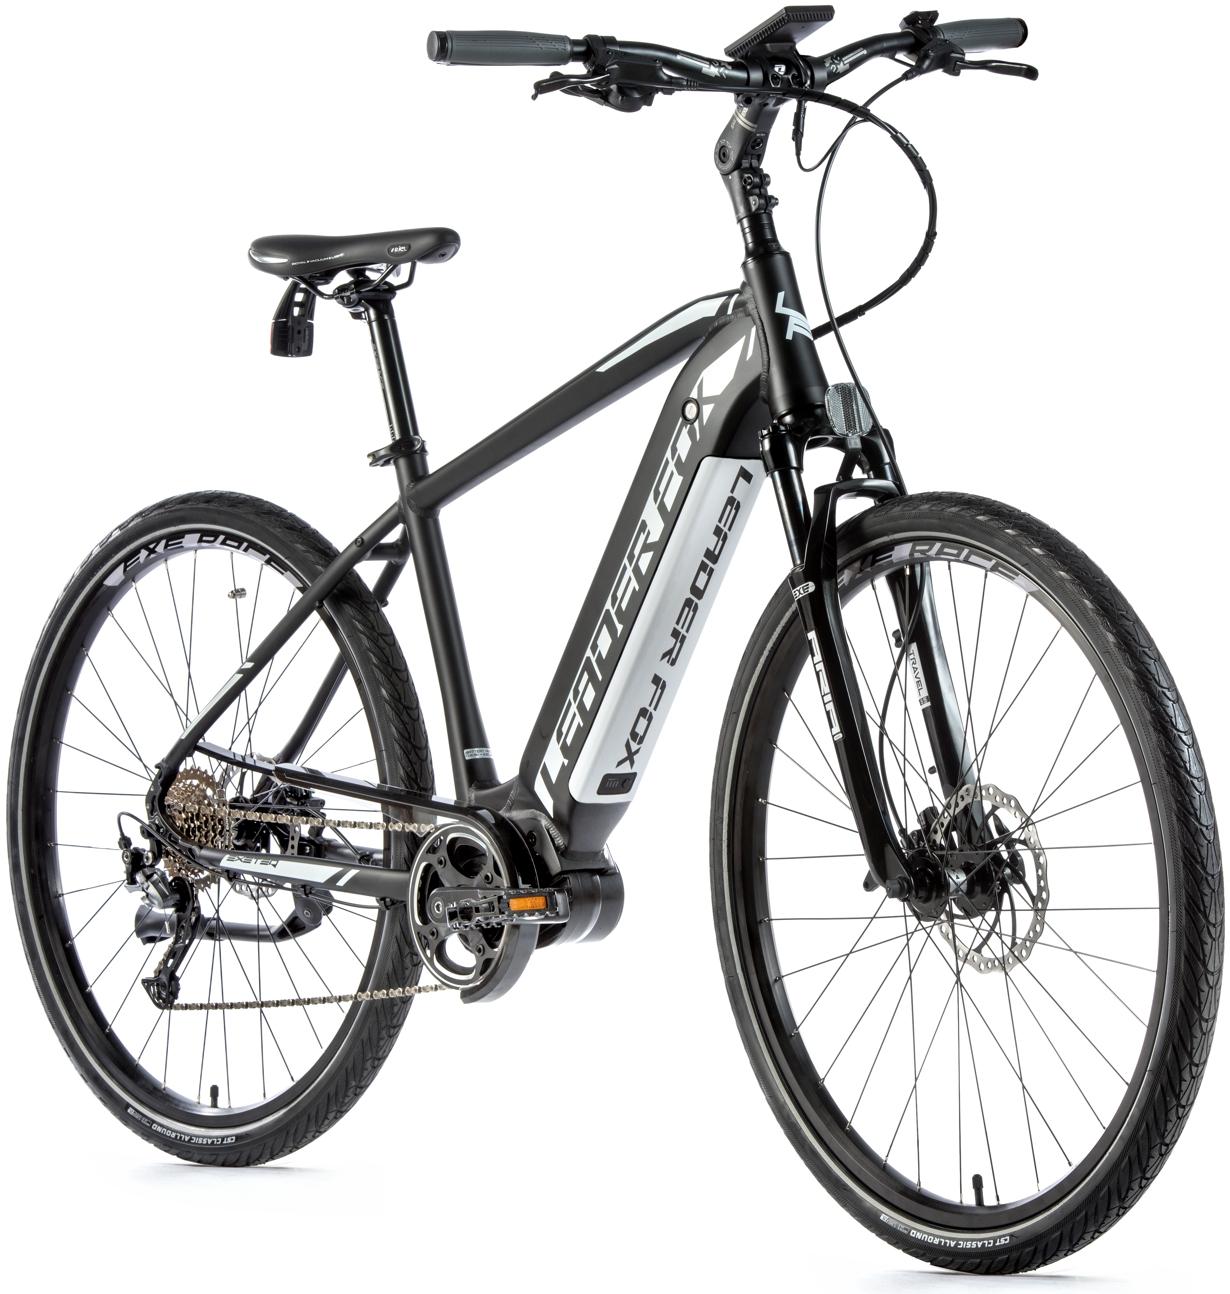 Bicicleta electrica Cross Leader Fox Exeter Gent, 2020